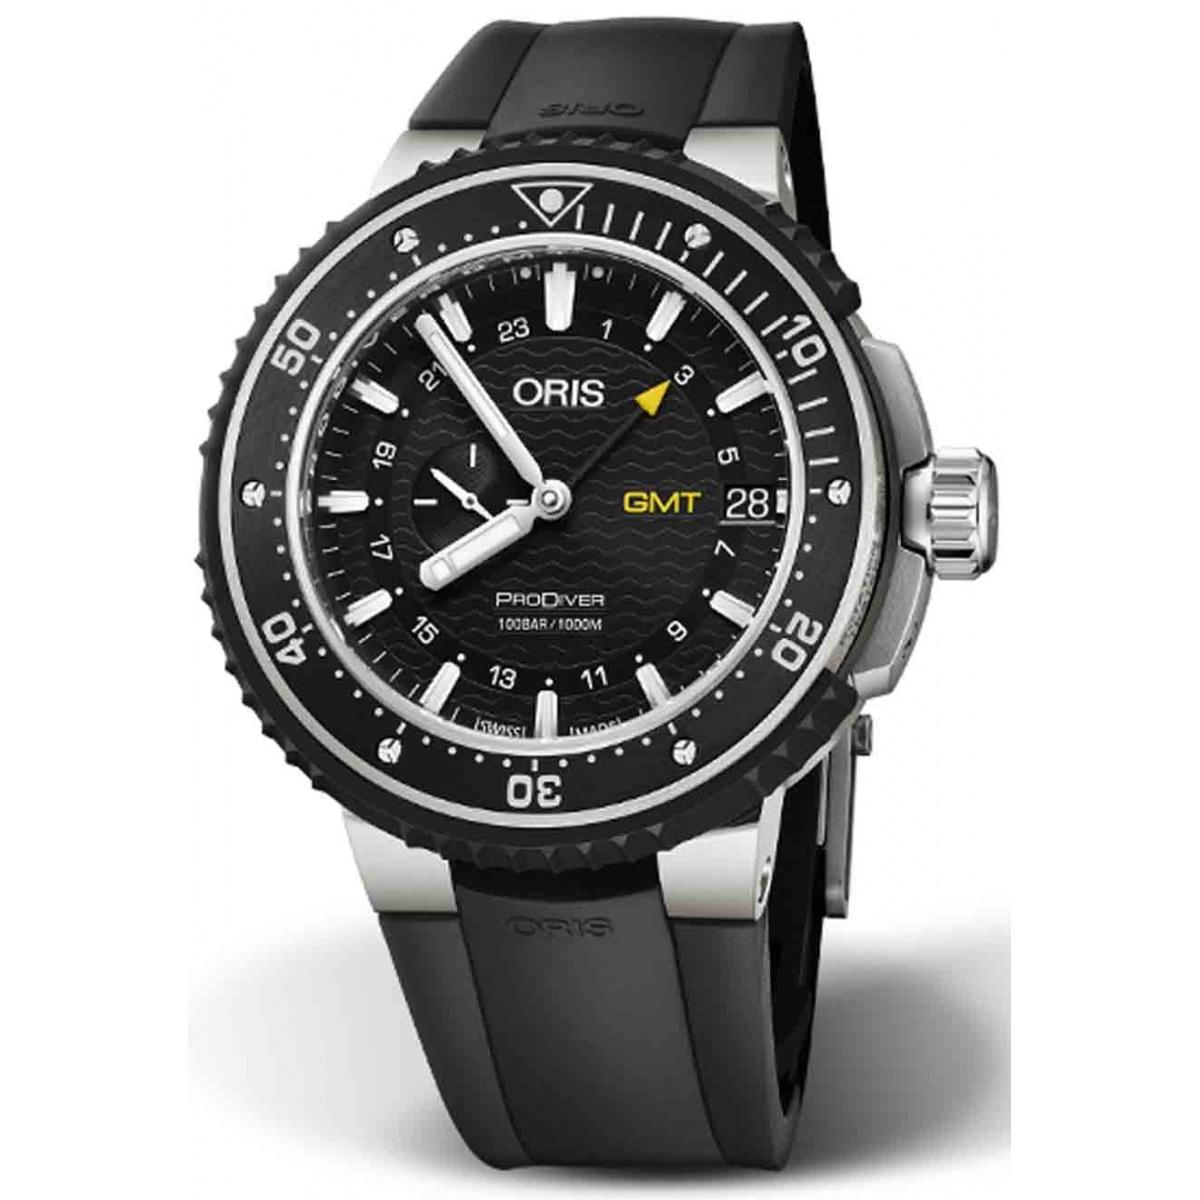 ORIS PRODIVER GMT 100 M ∅49 mm, Esfera negra, brazalete de caucho negro